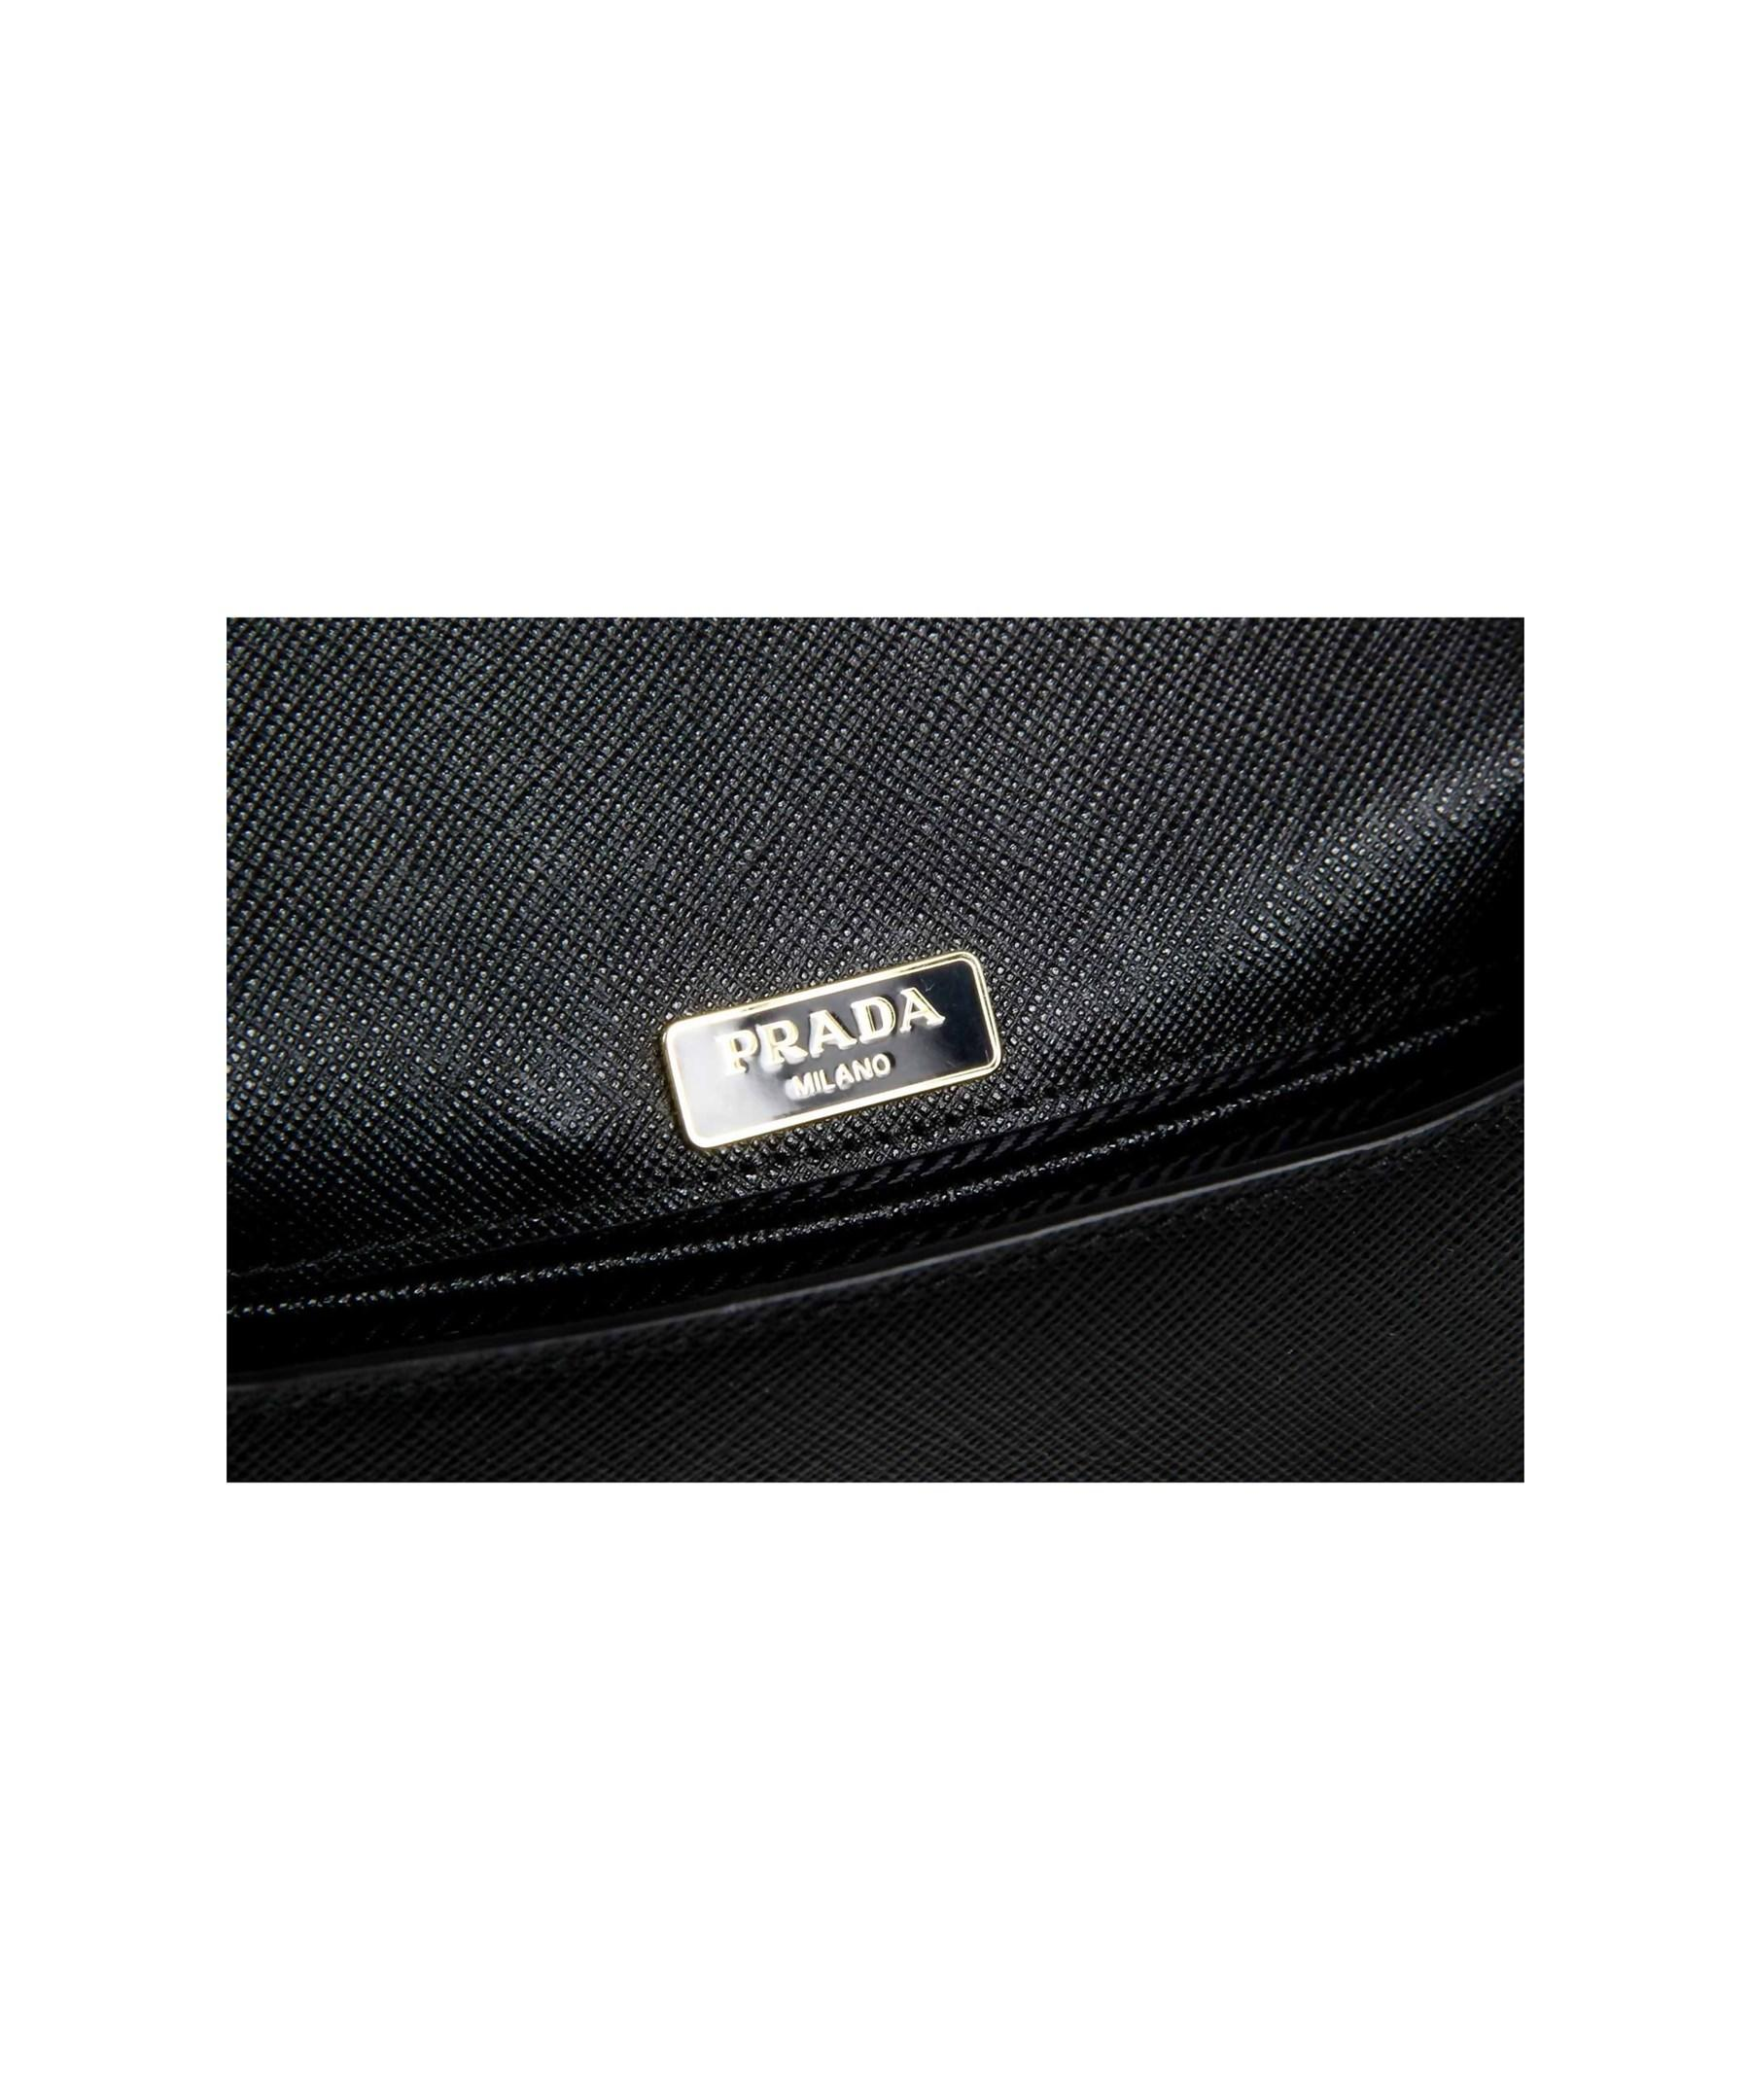 spain lyst prada ladies 1bh015 bandolero saffiano handbag in black 16555  b5573 6897a39f41917